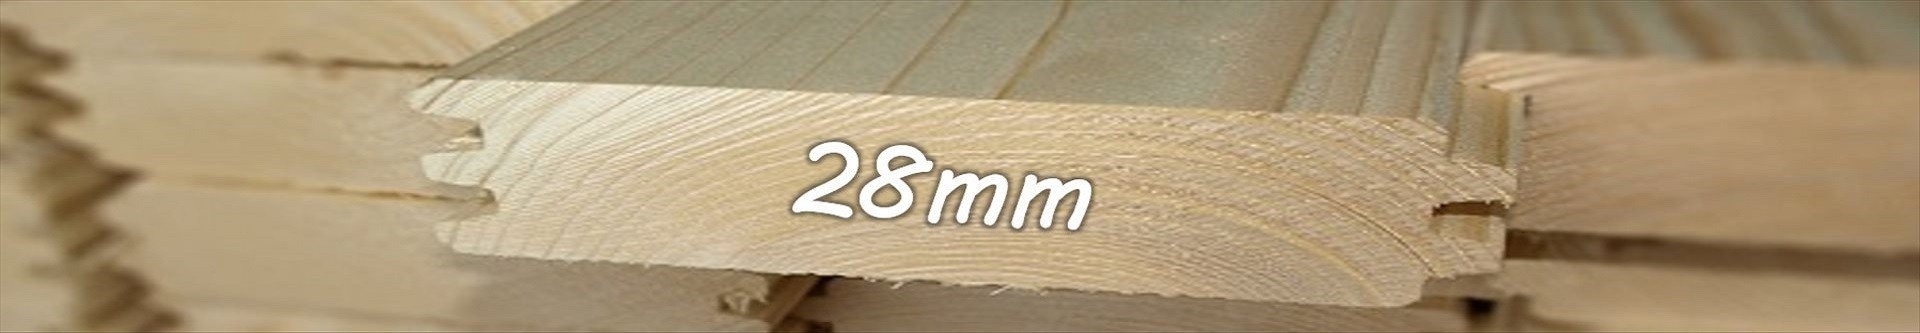 Casetas de jardín 28 mm